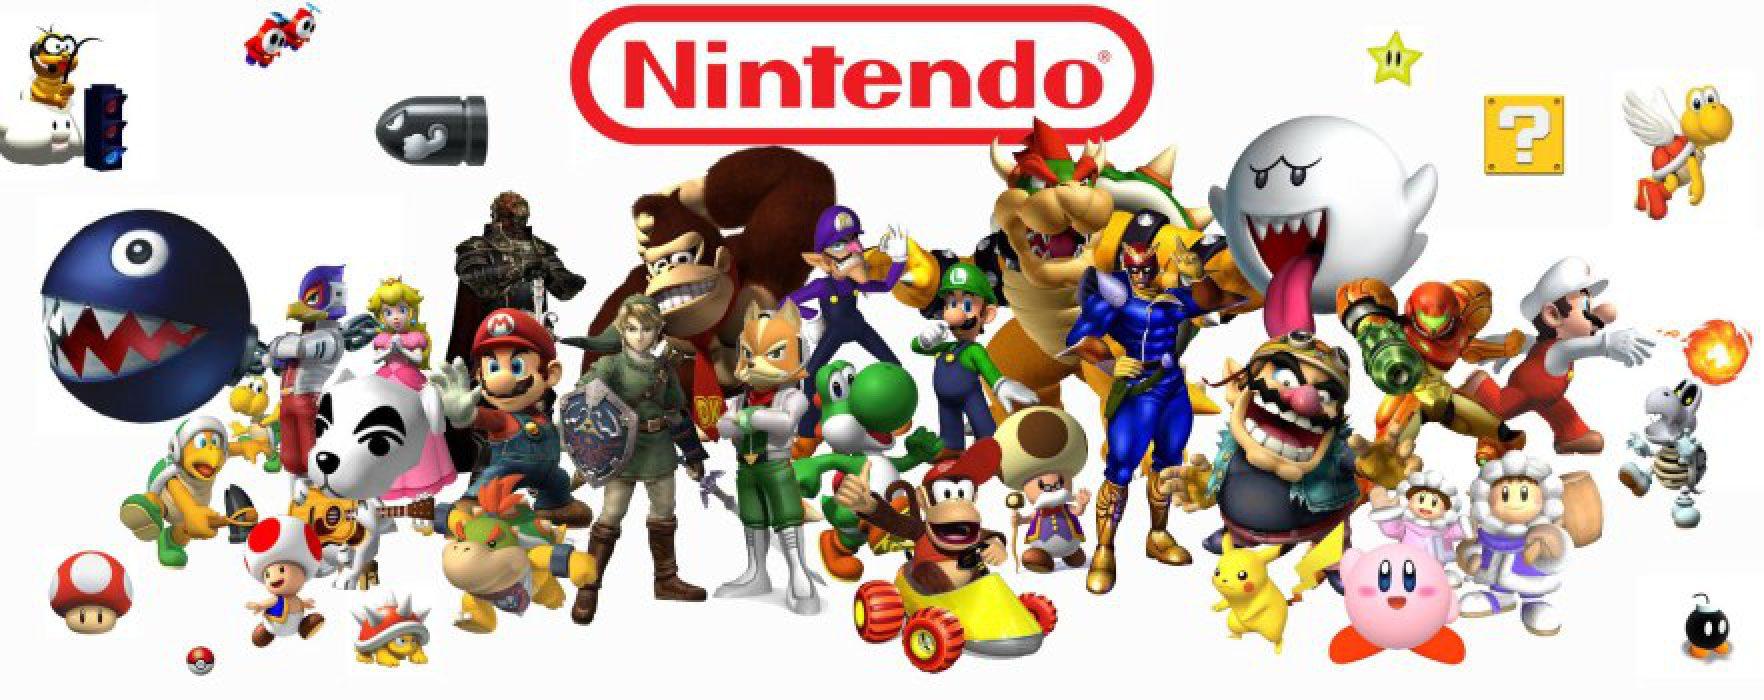 Nintendo at E3: Breath of the Wild DLC, Pokemon, and More